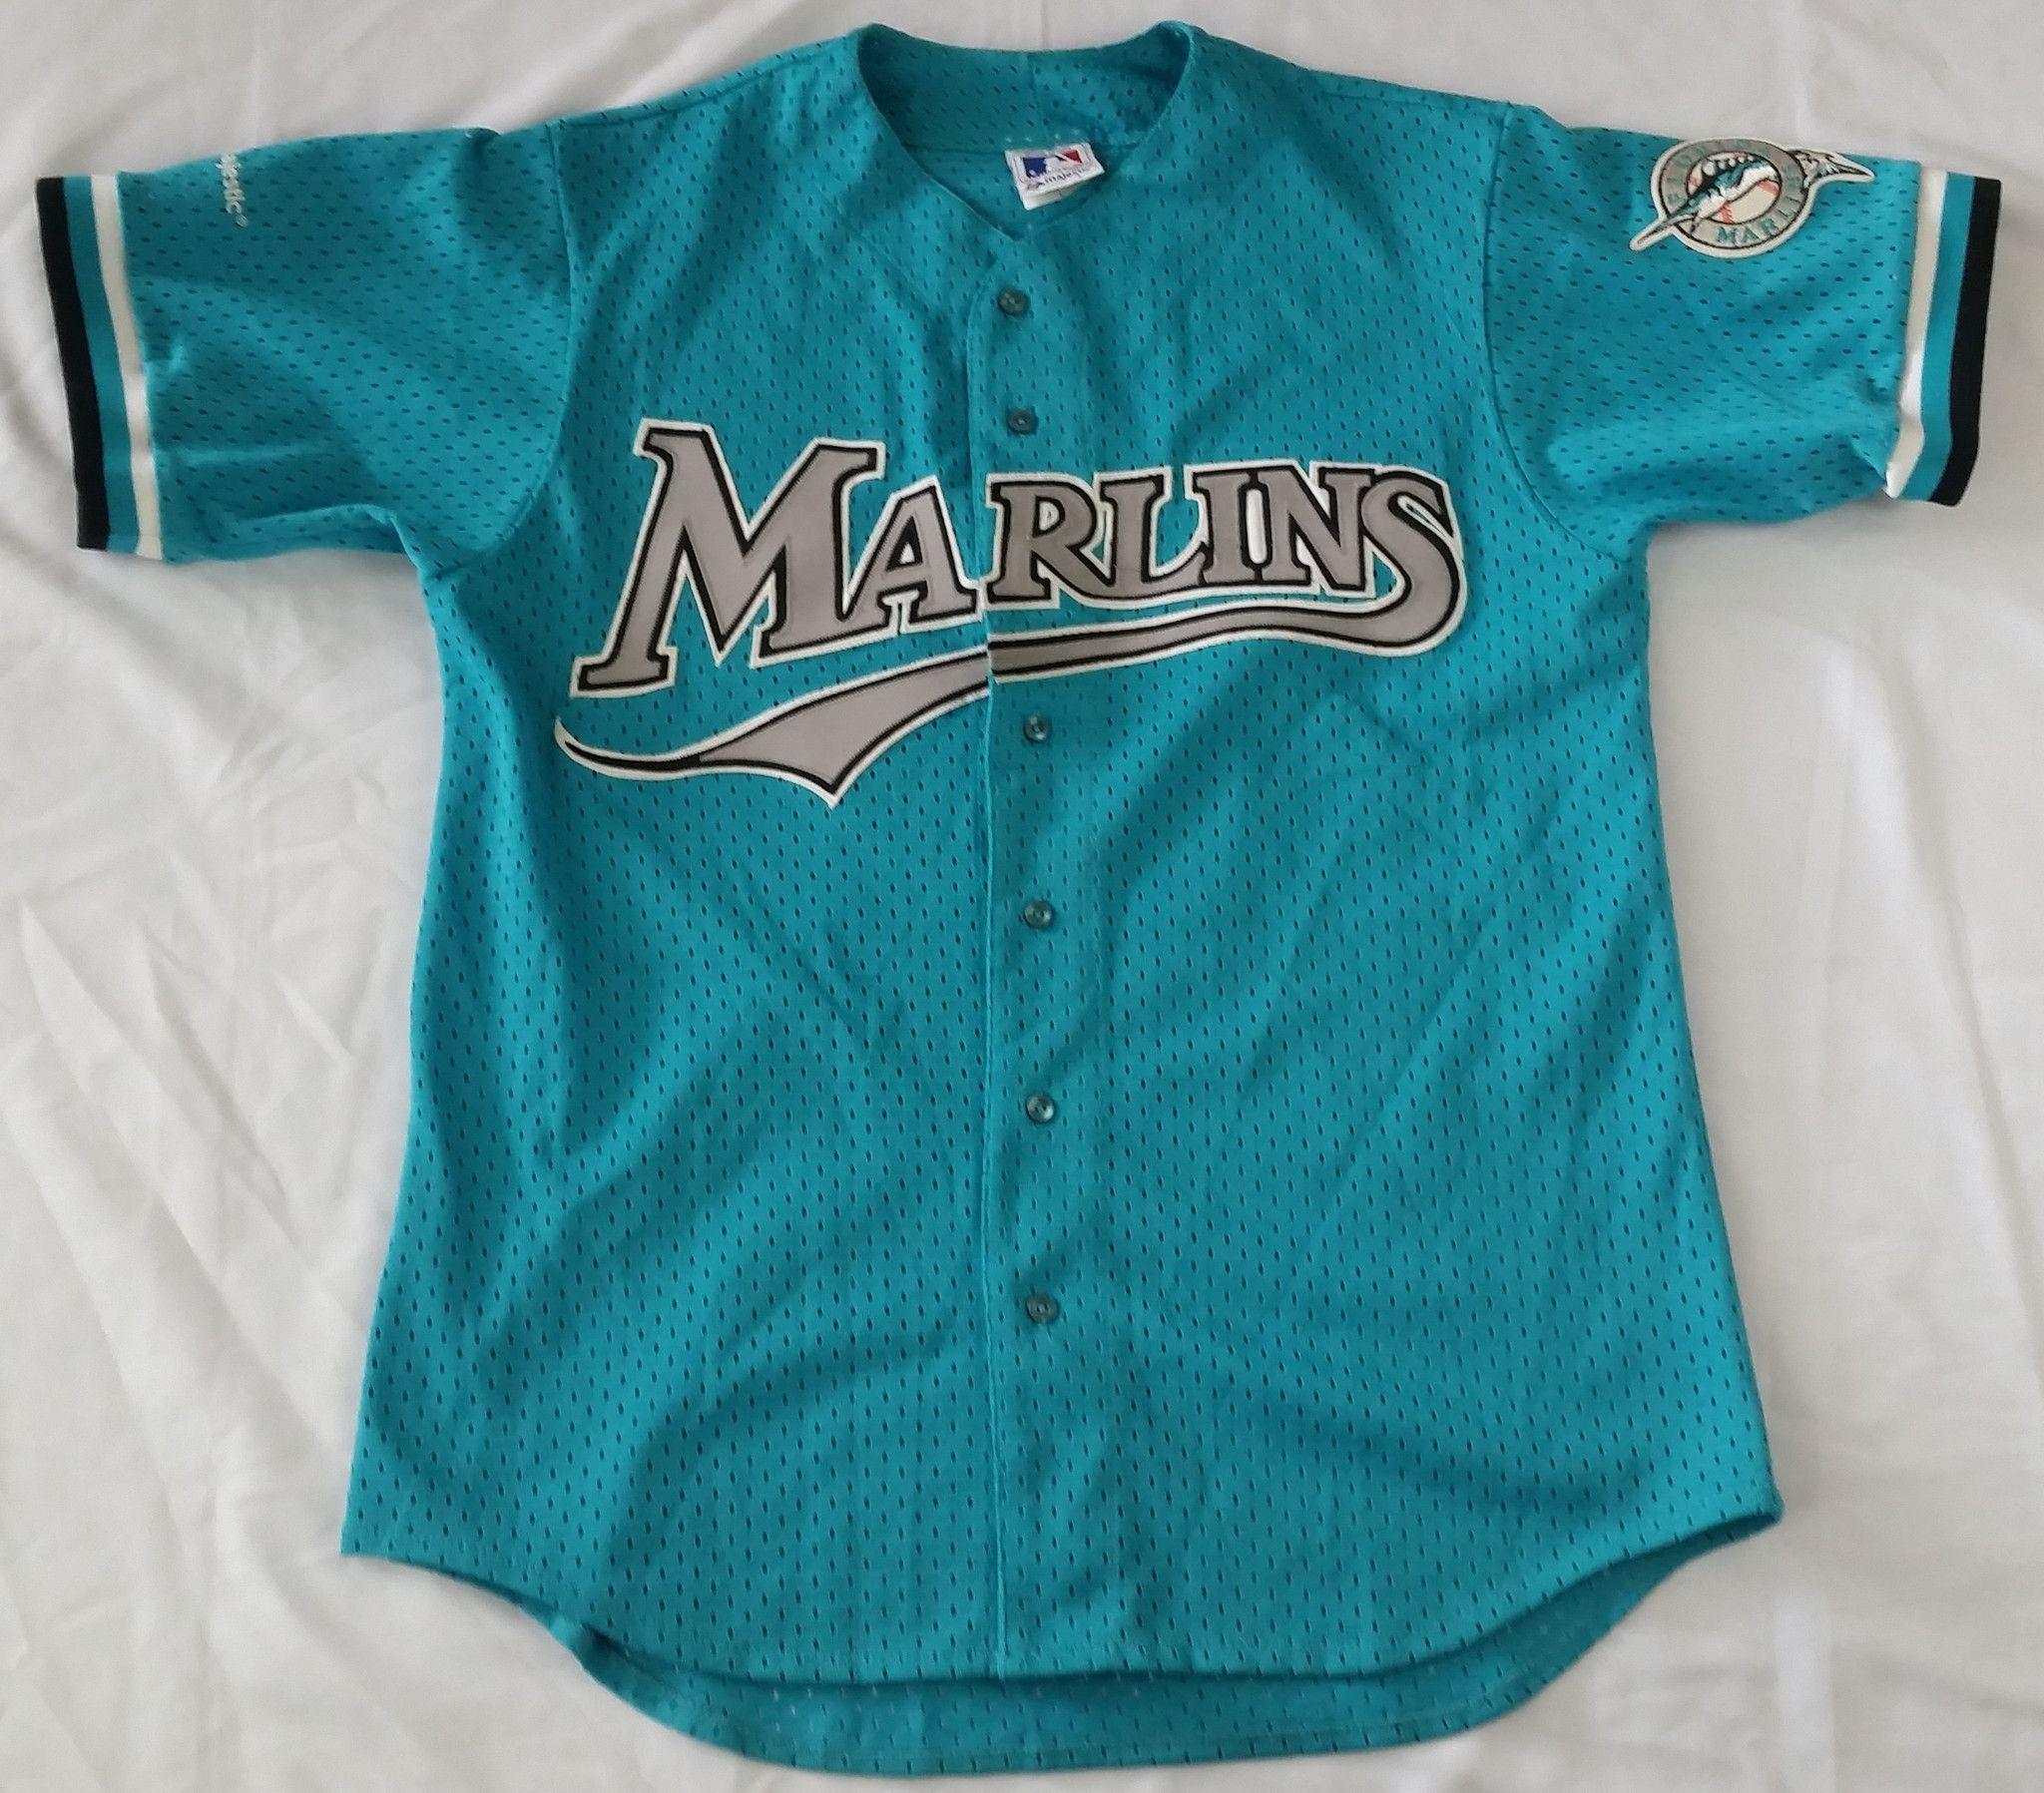 db476331832 ... canada florida marlins vintage majestic jersey mlb baseball rare miami  russell mens l 381d0 18d48